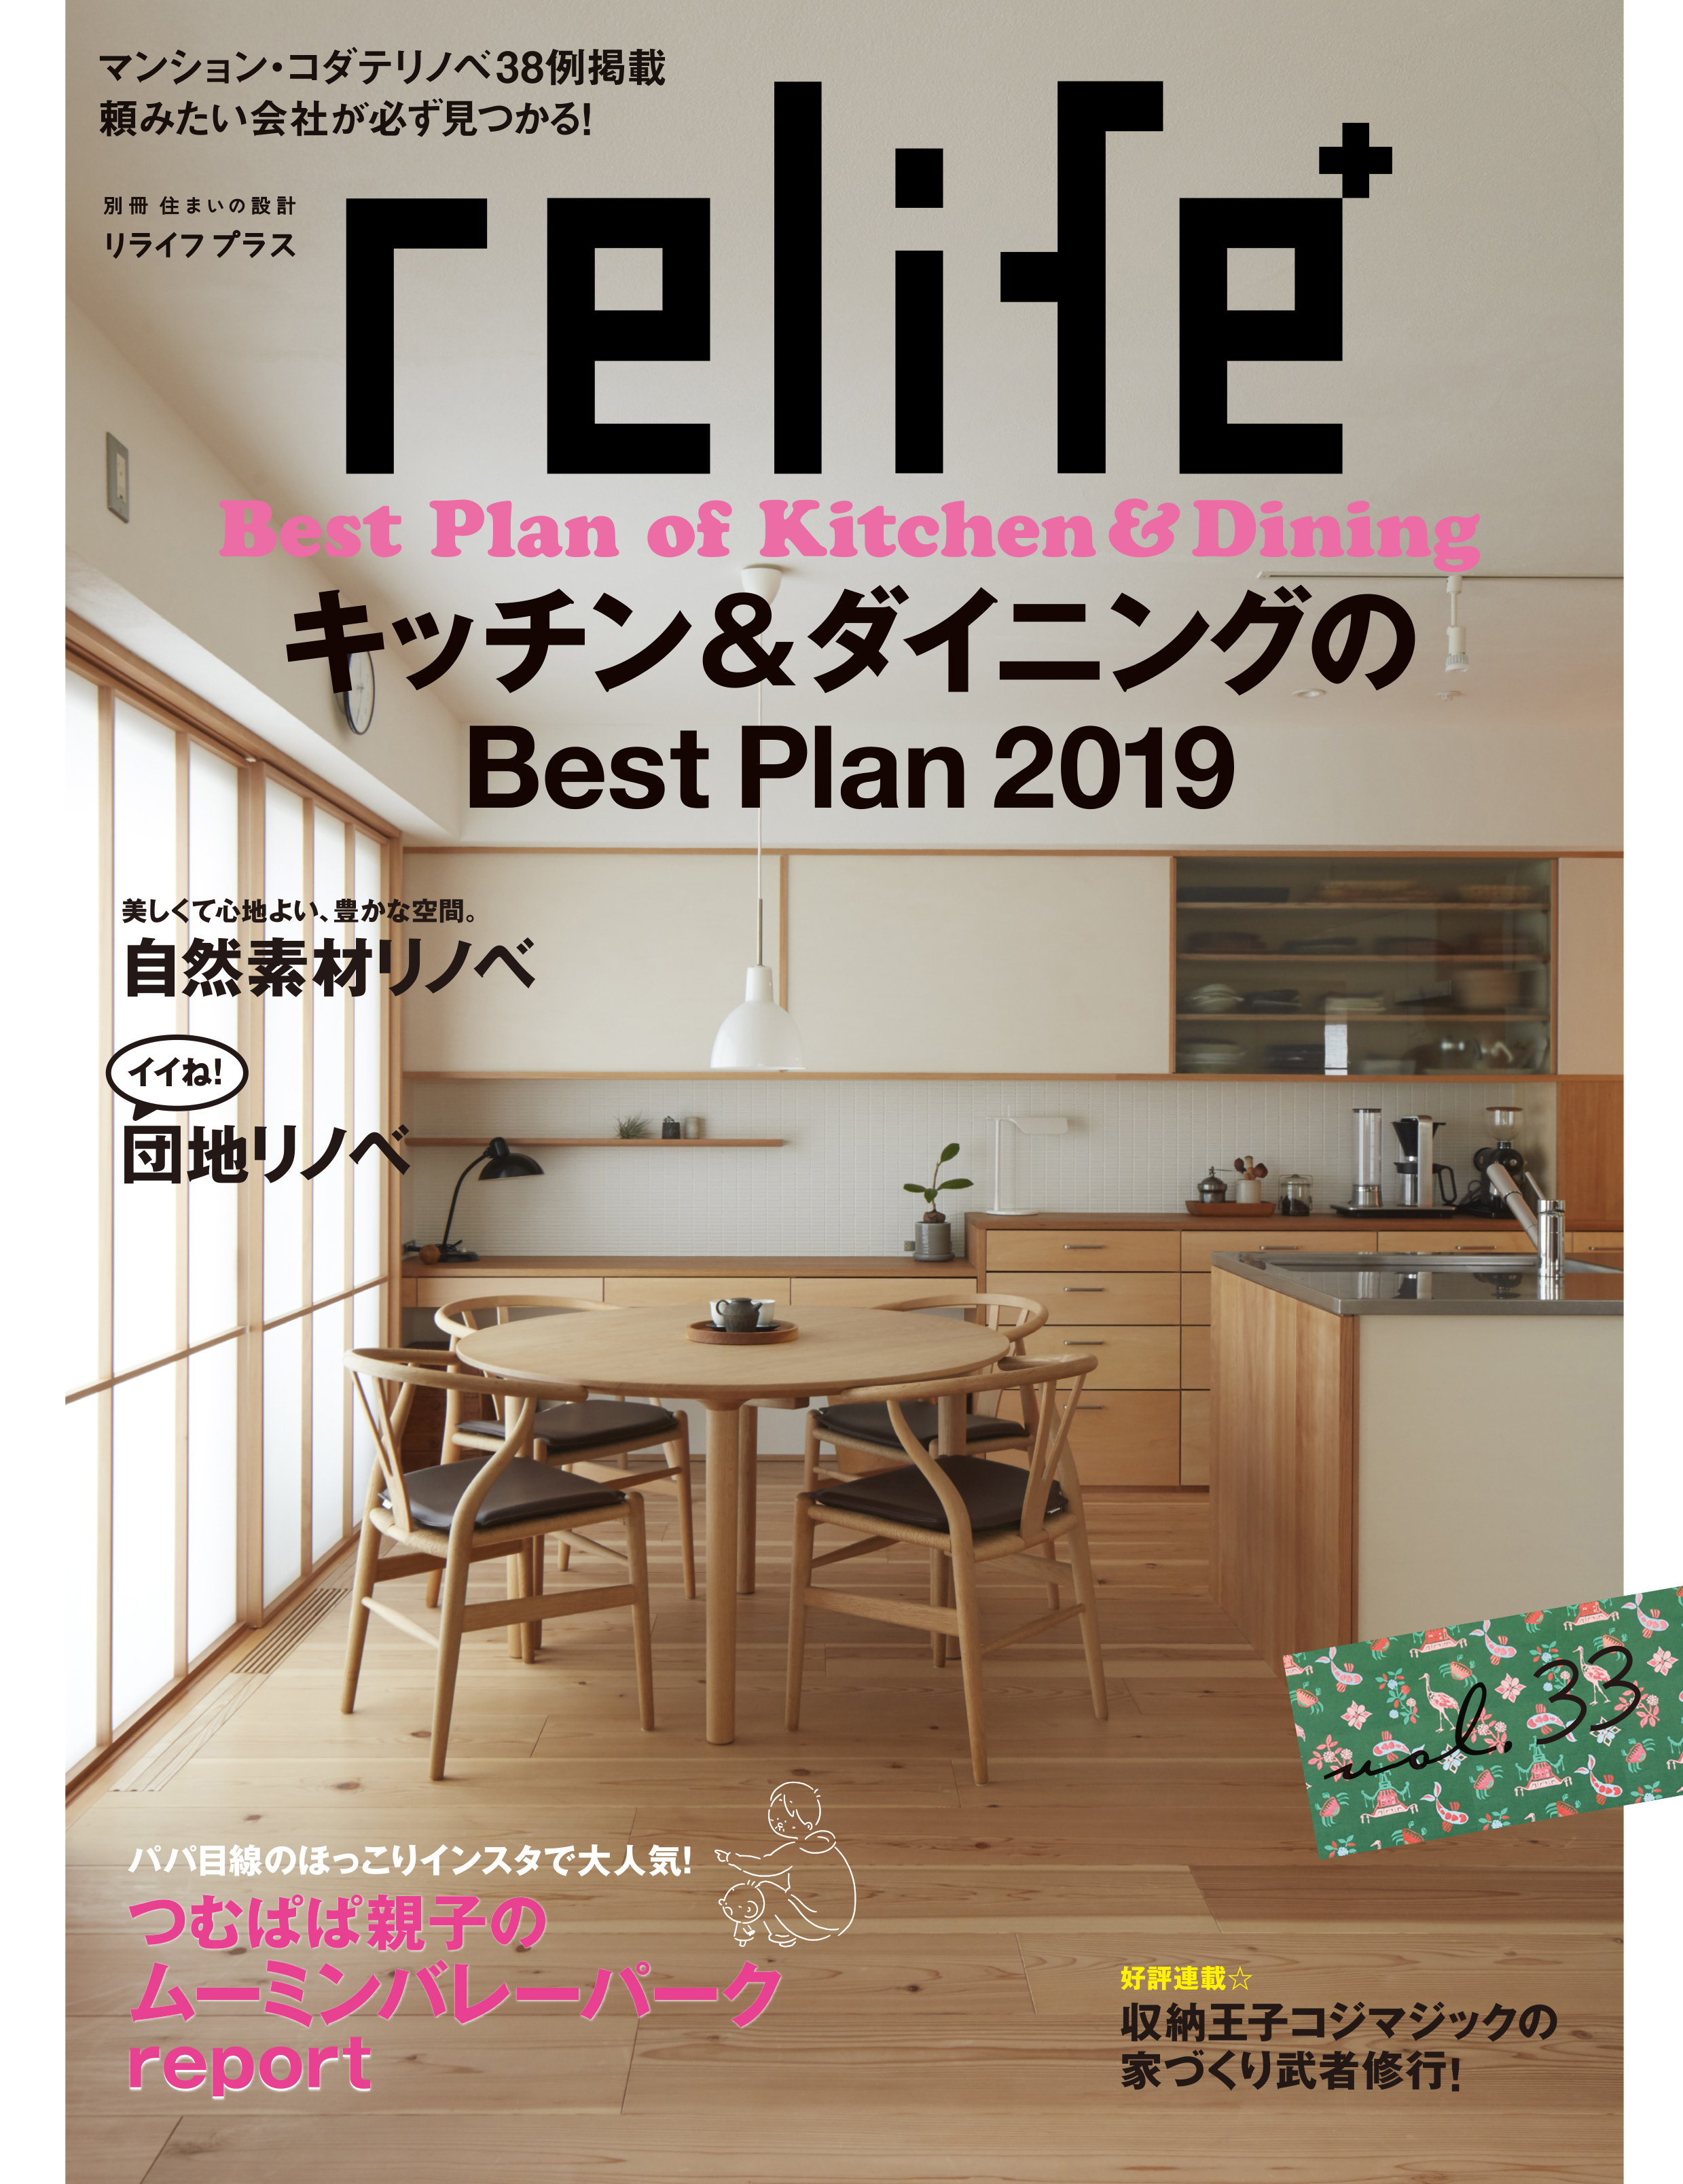 記事掲載:雑誌「relife+ vol.33」!